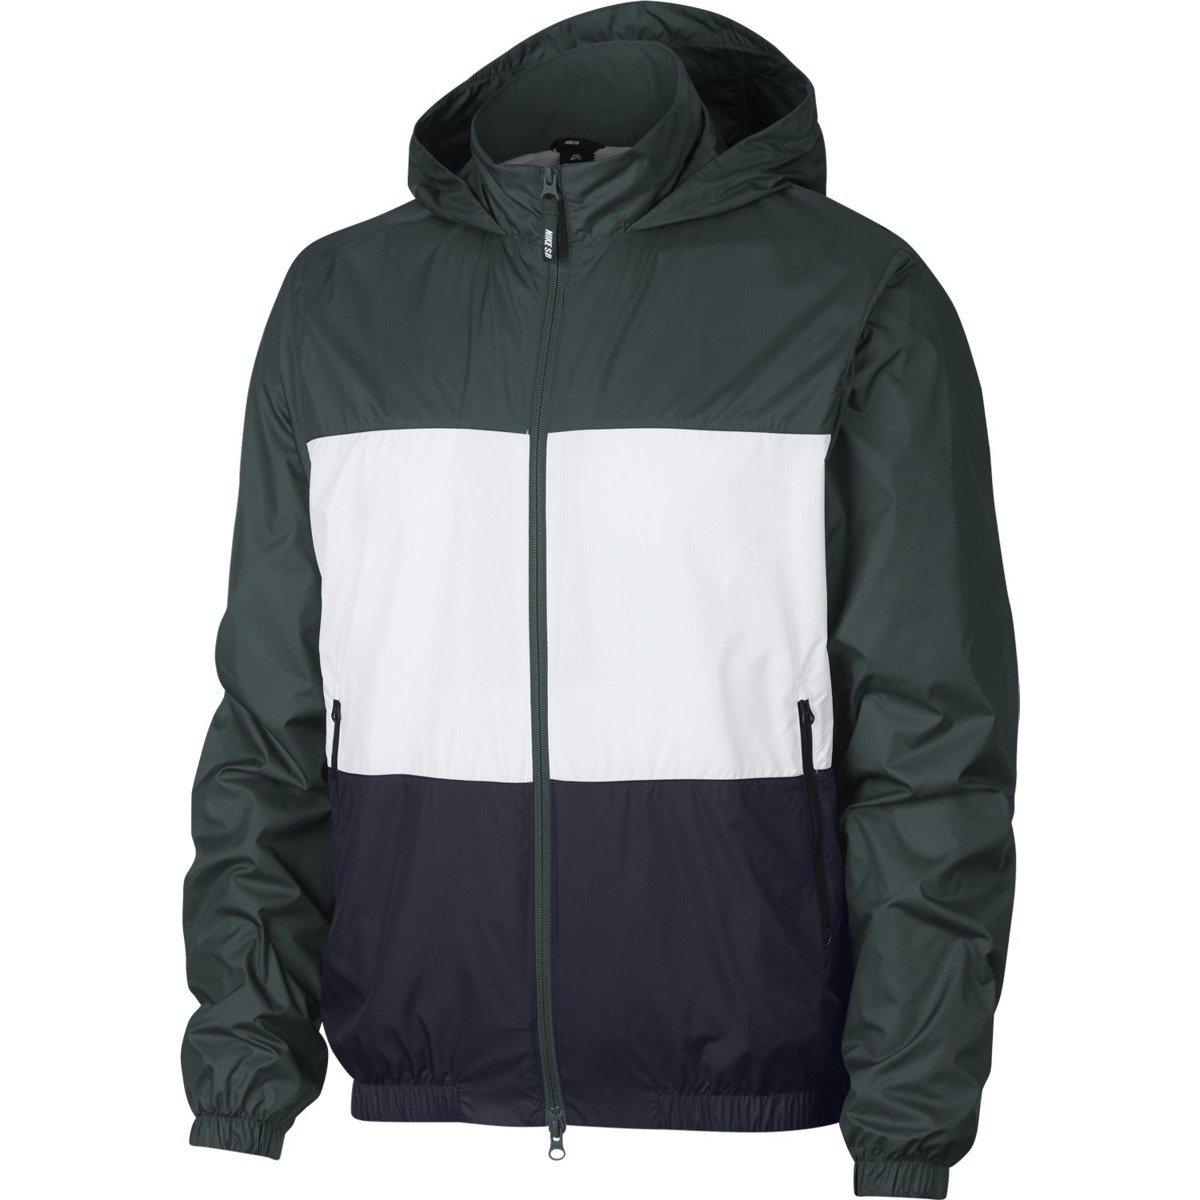 fa5929243 nike sb Shield MIDNIGHT GREEN/WHITE/OBSIDIAN green | Clothes \ Jackets  Brands \ Nike SB SALE \ Sale - 40% \ Jackets Odzież \ Nike SB \ Nike SB  Fall 2018 ...